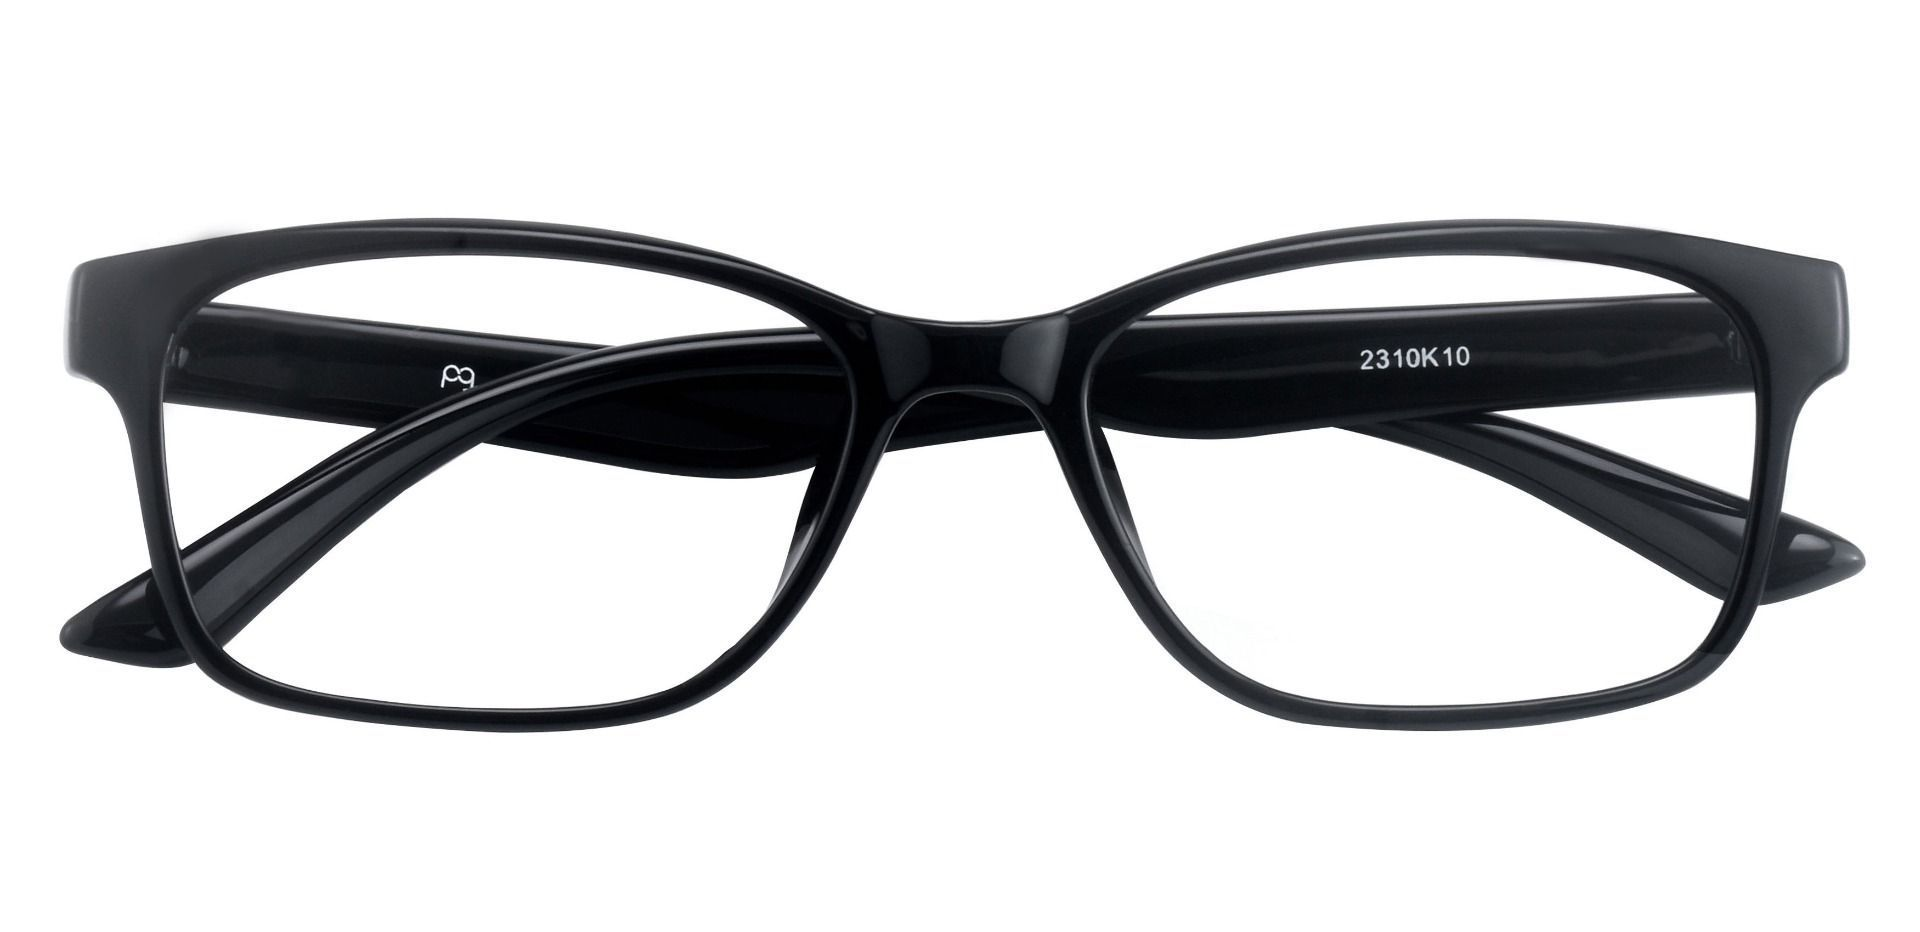 Osmond Rectangle Prescription Glasses - Black